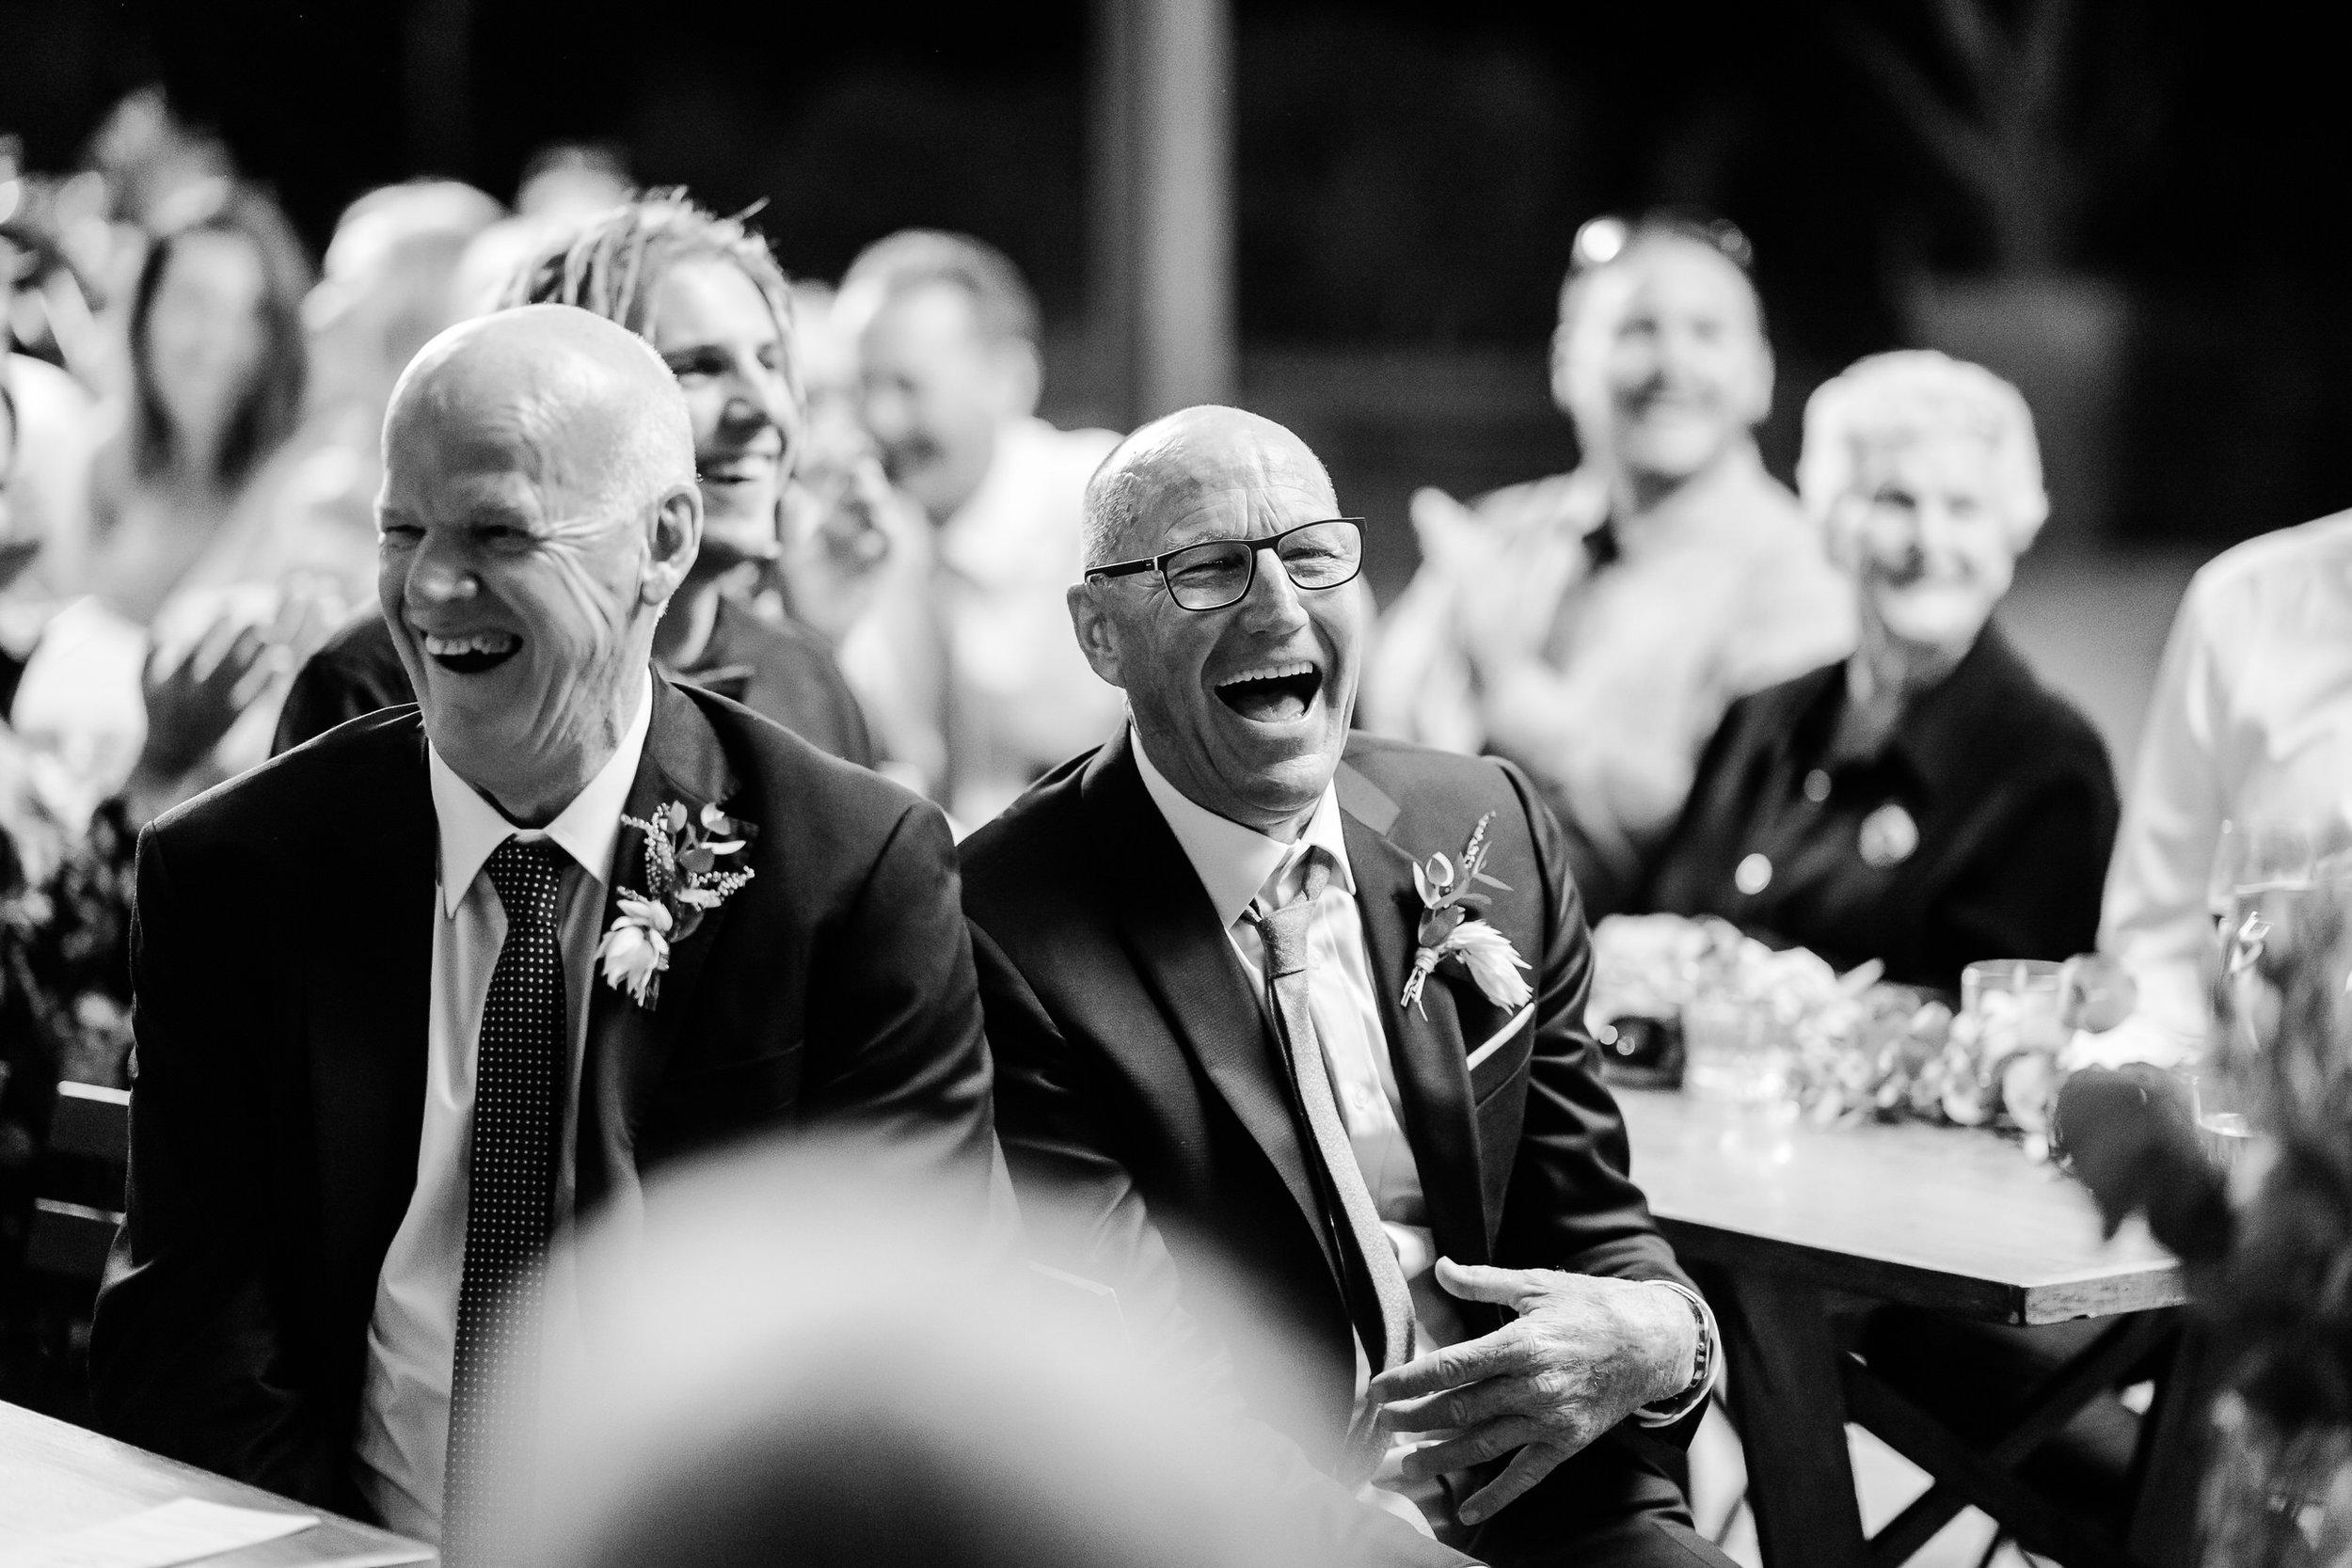 Justin_And_Jim_Photography_Byron_Bay_Wedding106.JPG